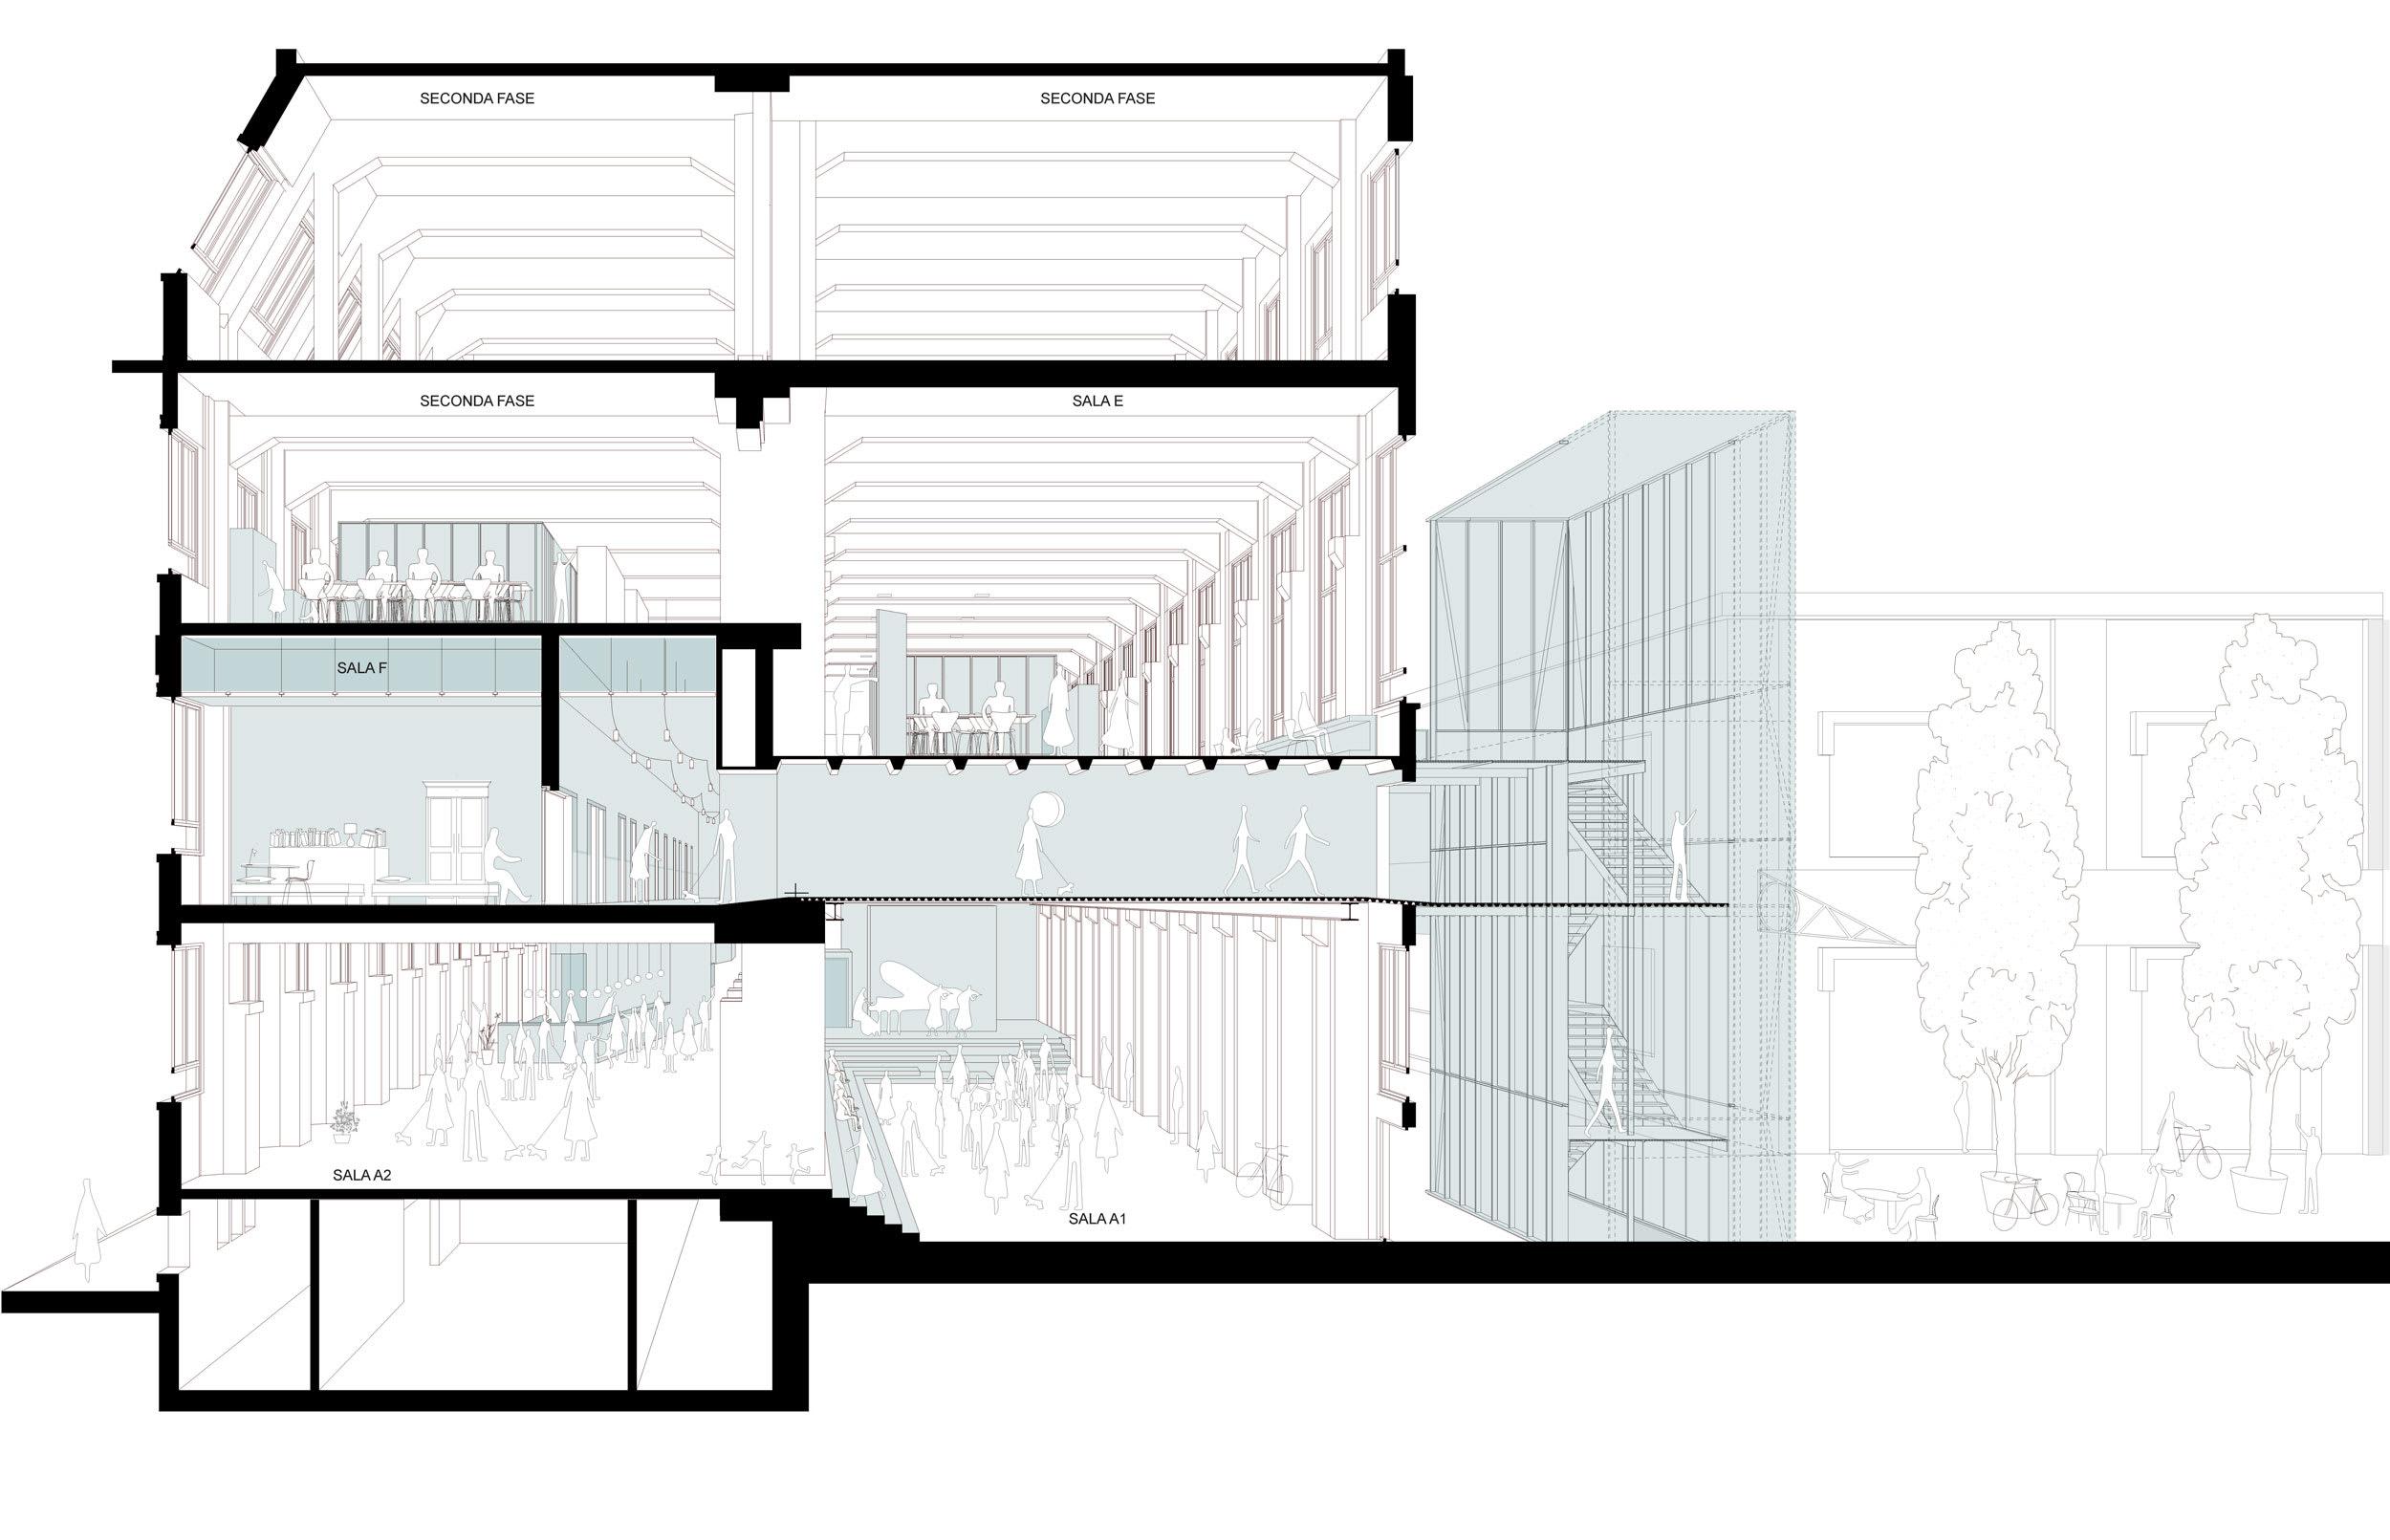 Studio La Sala Milano onsitestudio, anders sune berg, giovanna silva · base milano